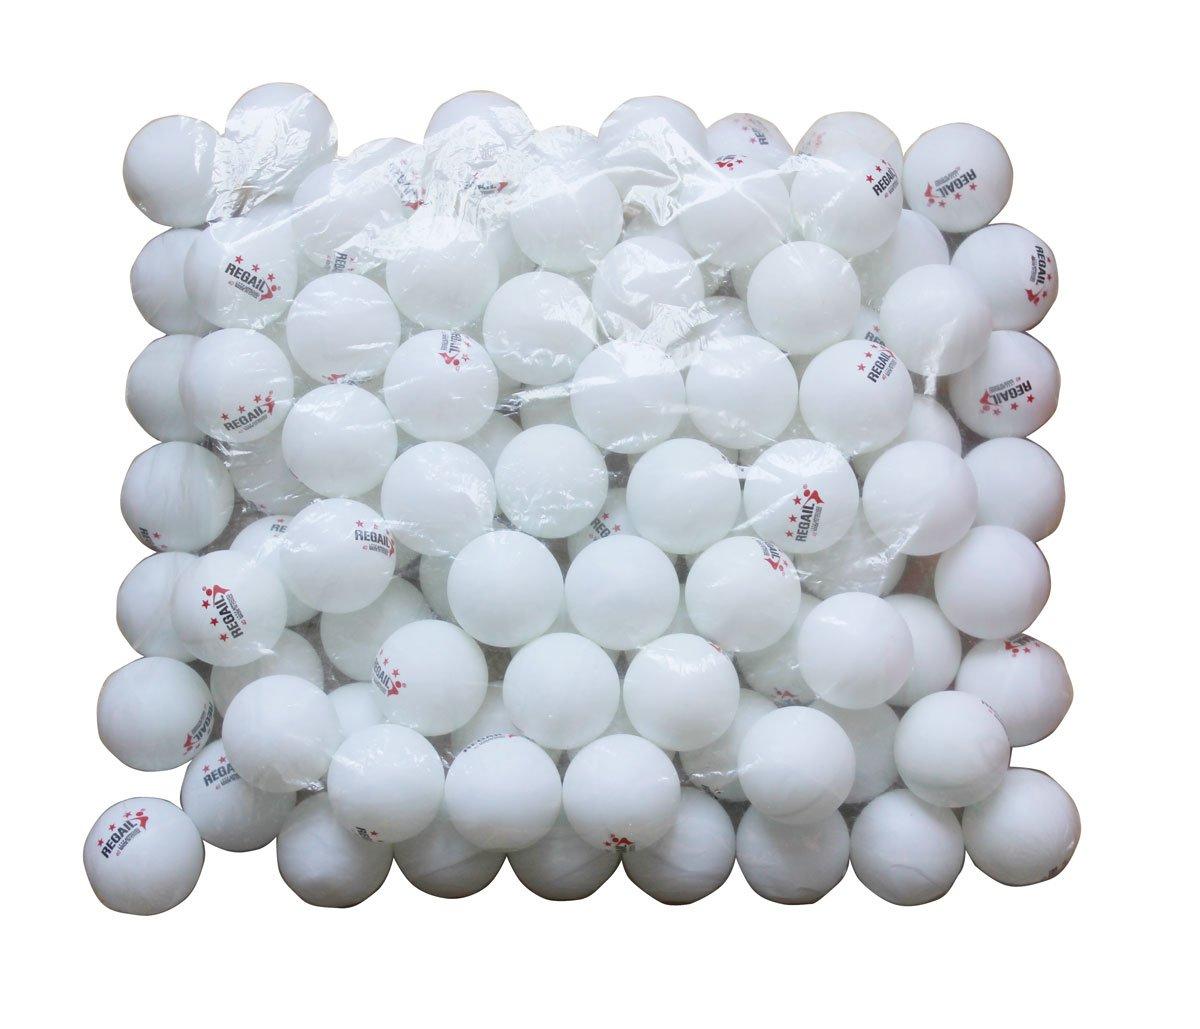 REGAIL 100 White 3-star 40mm Table Tennis Balls Advanced Training Ping Pong Balls yinhe z7 vf table tennis ping pong blade